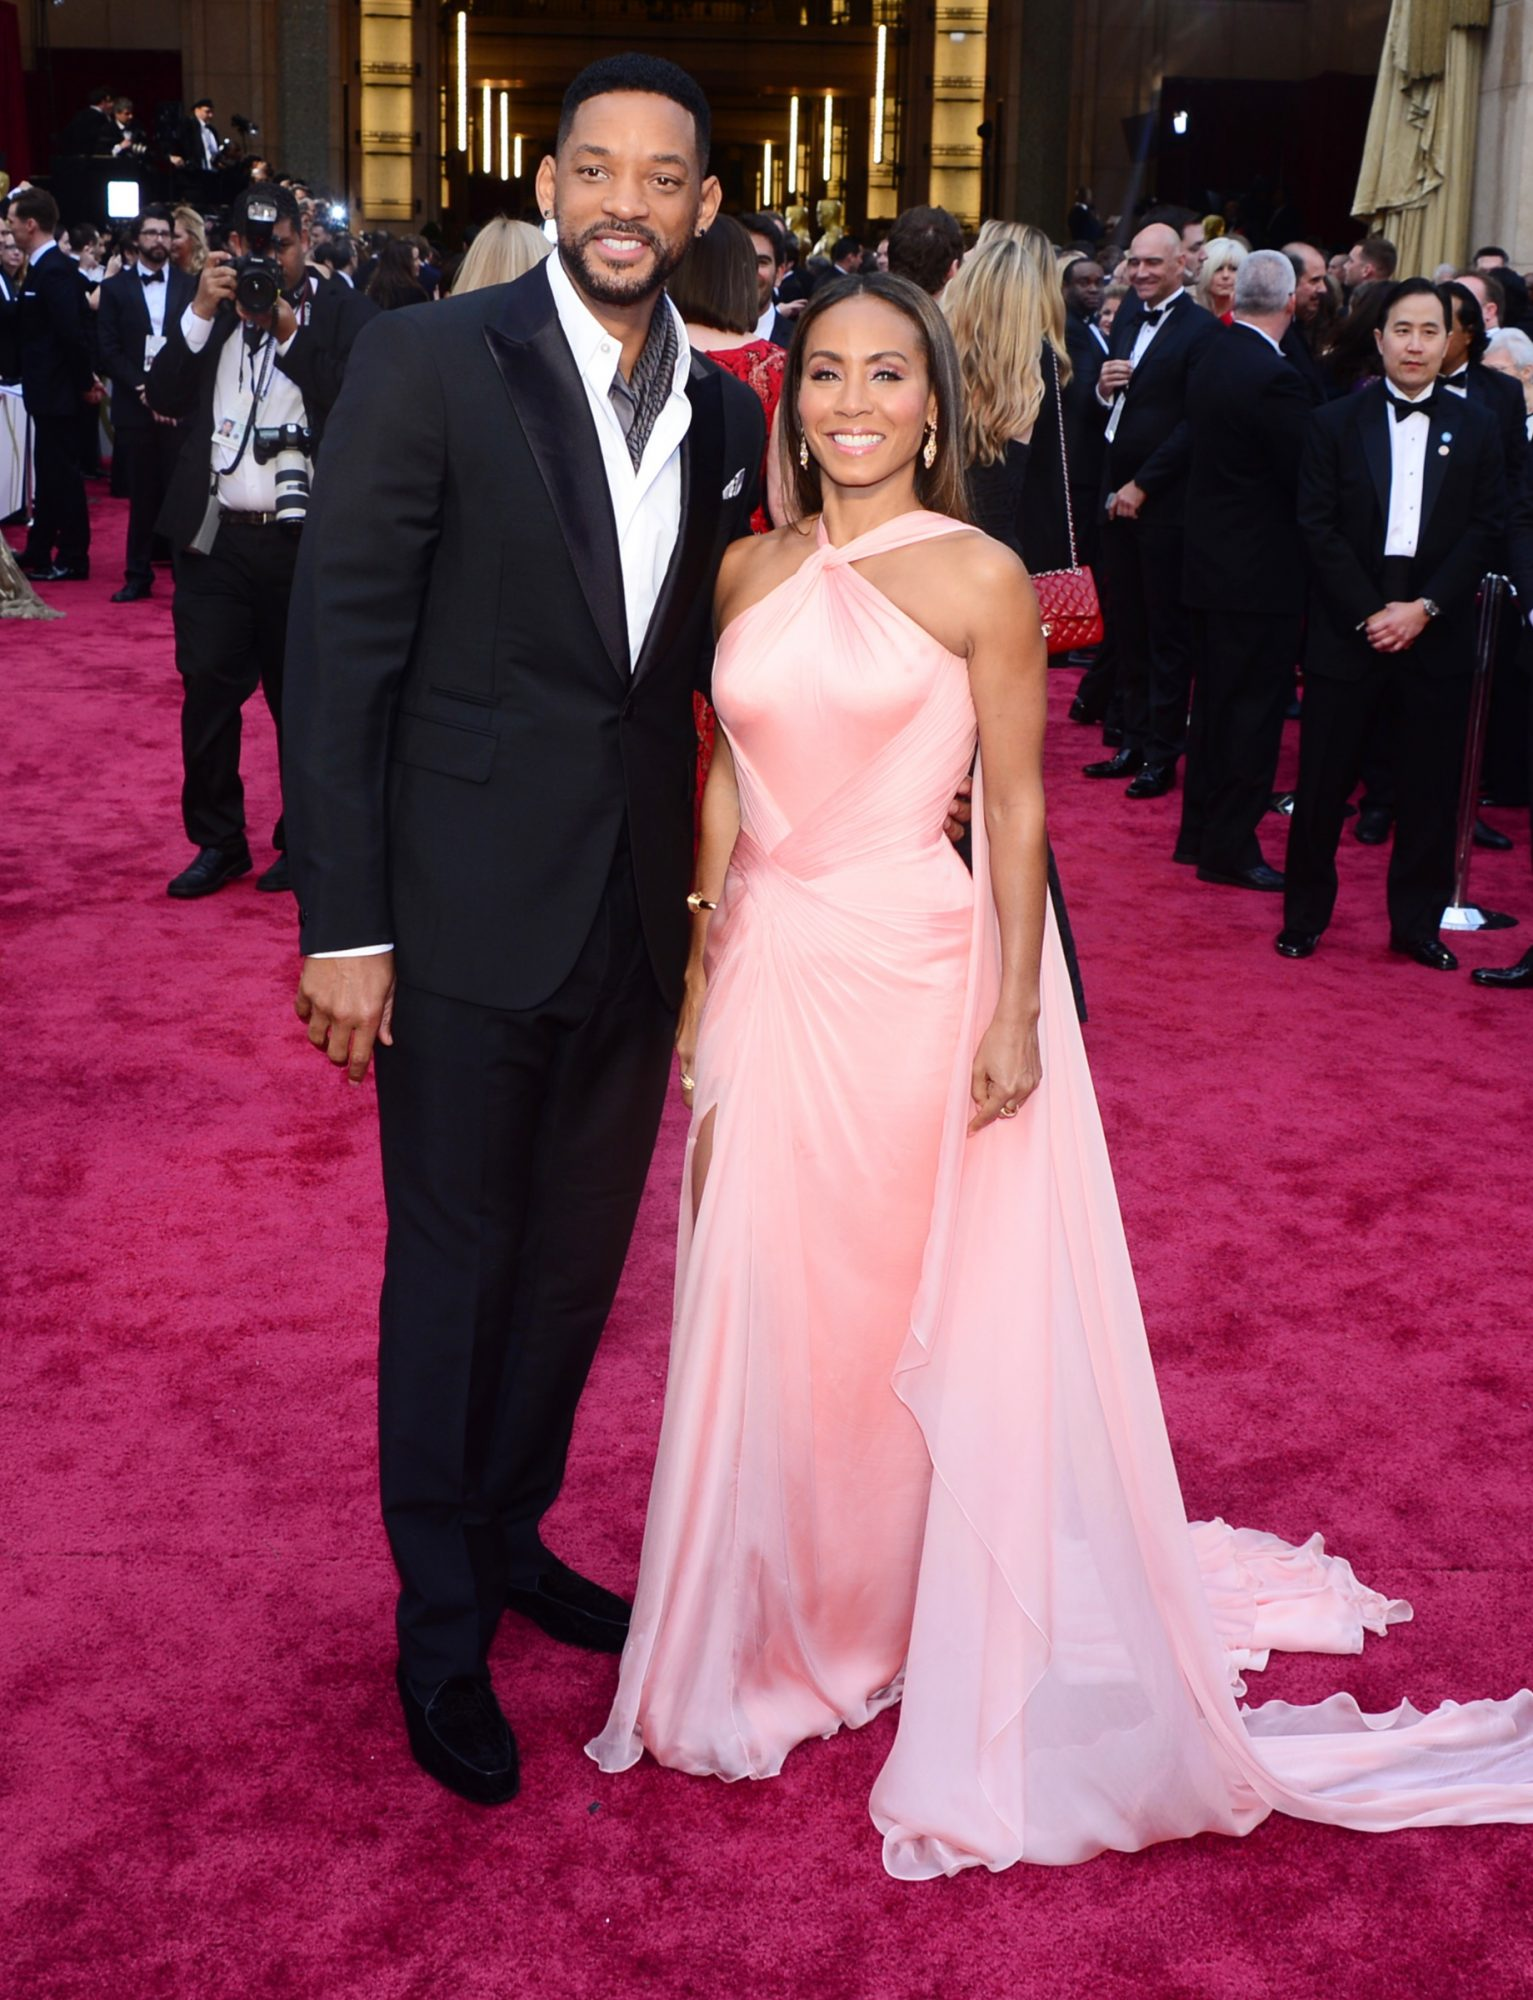 Will Smith and Jada Pinkett